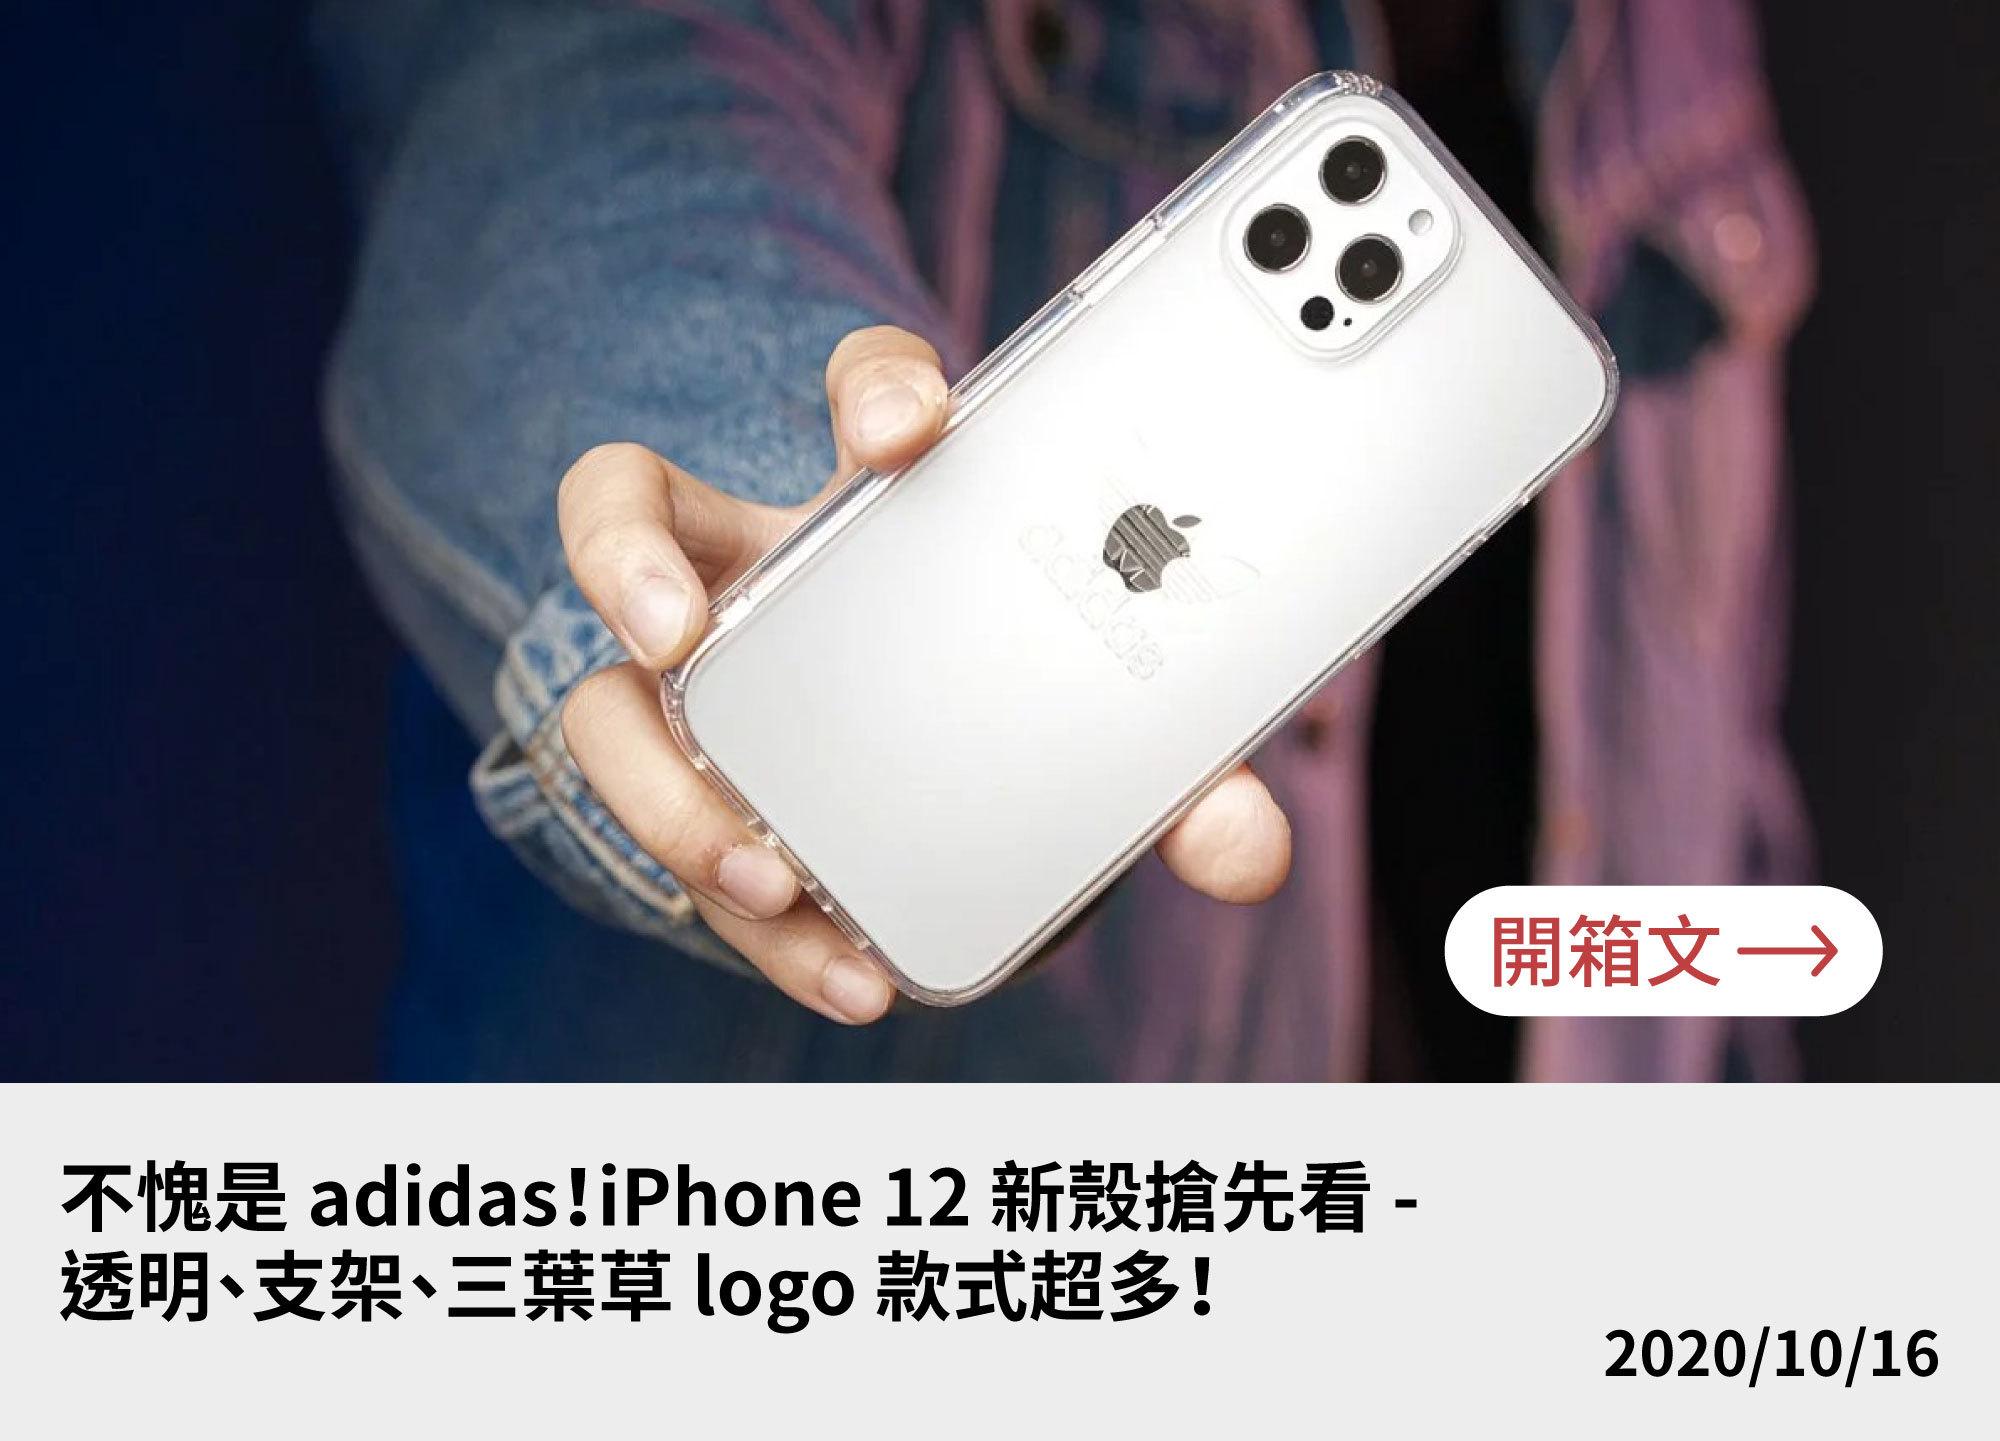 iphone12 adidas手機殼